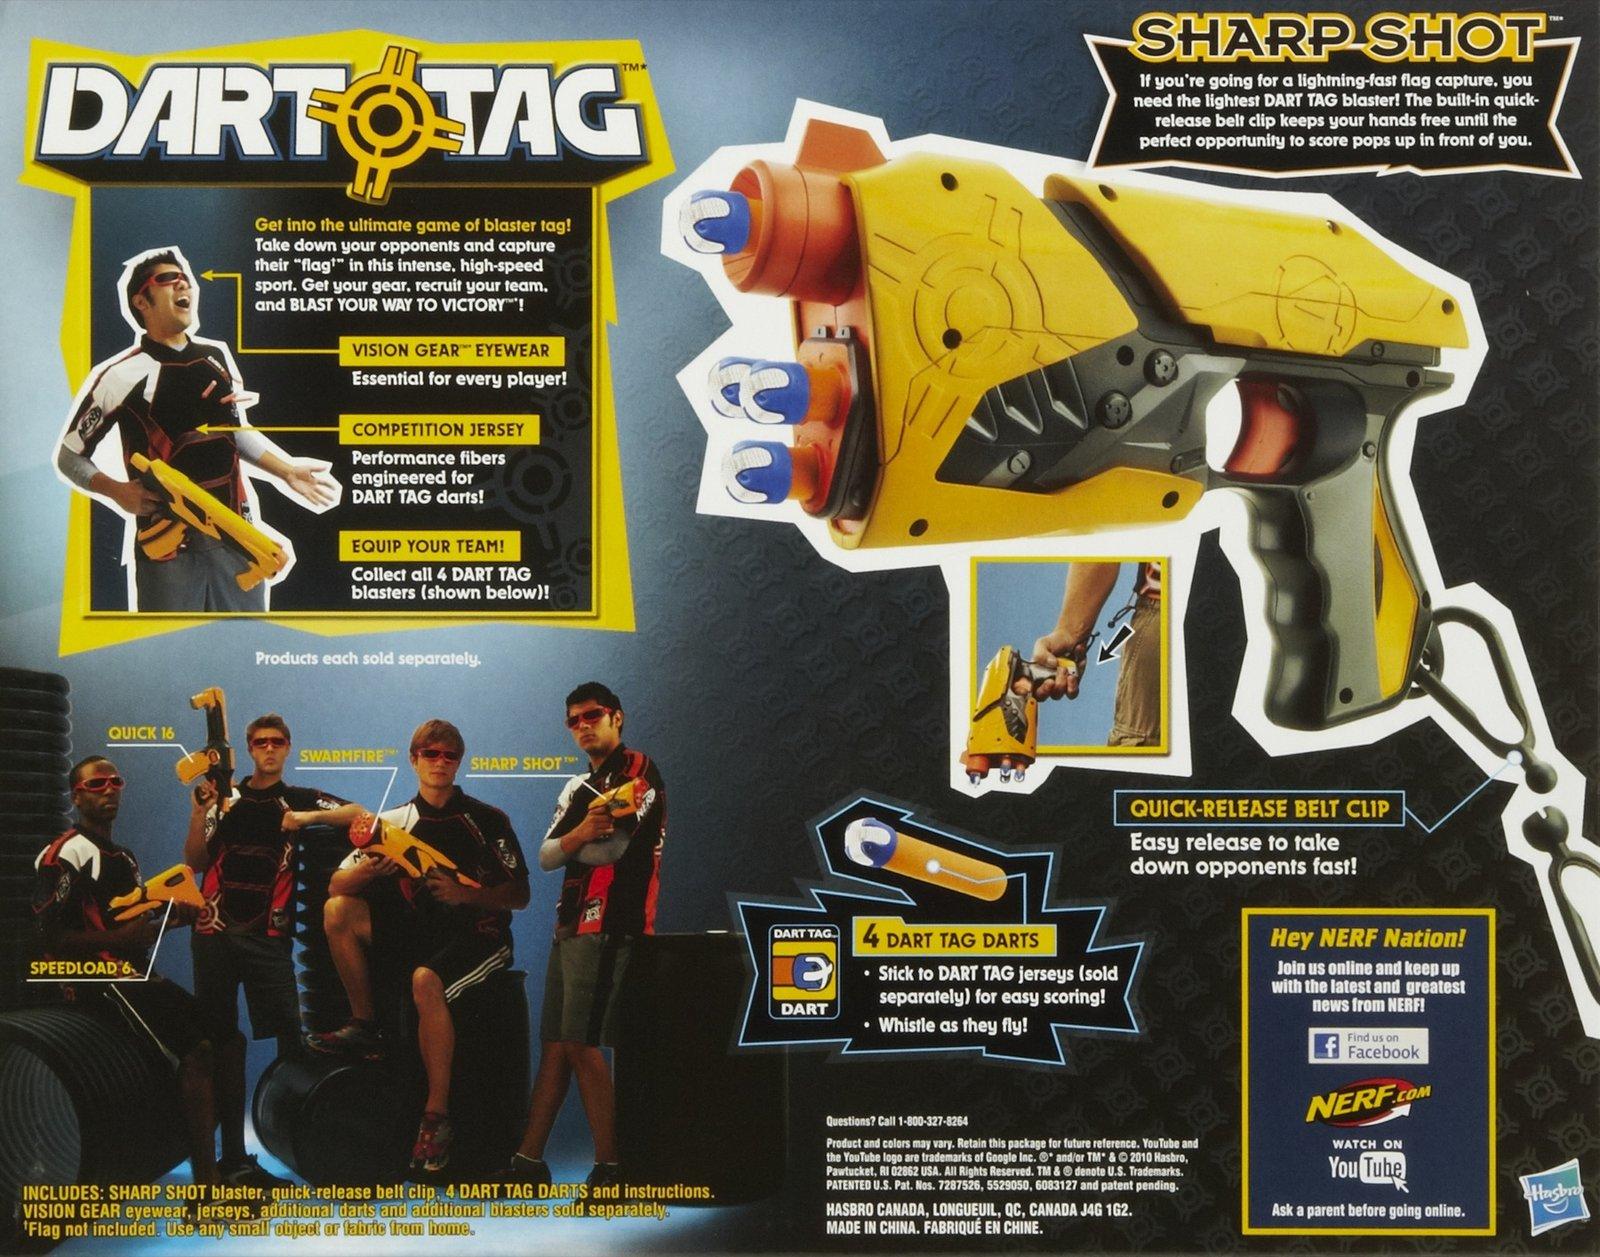 nerf sharp shot box back